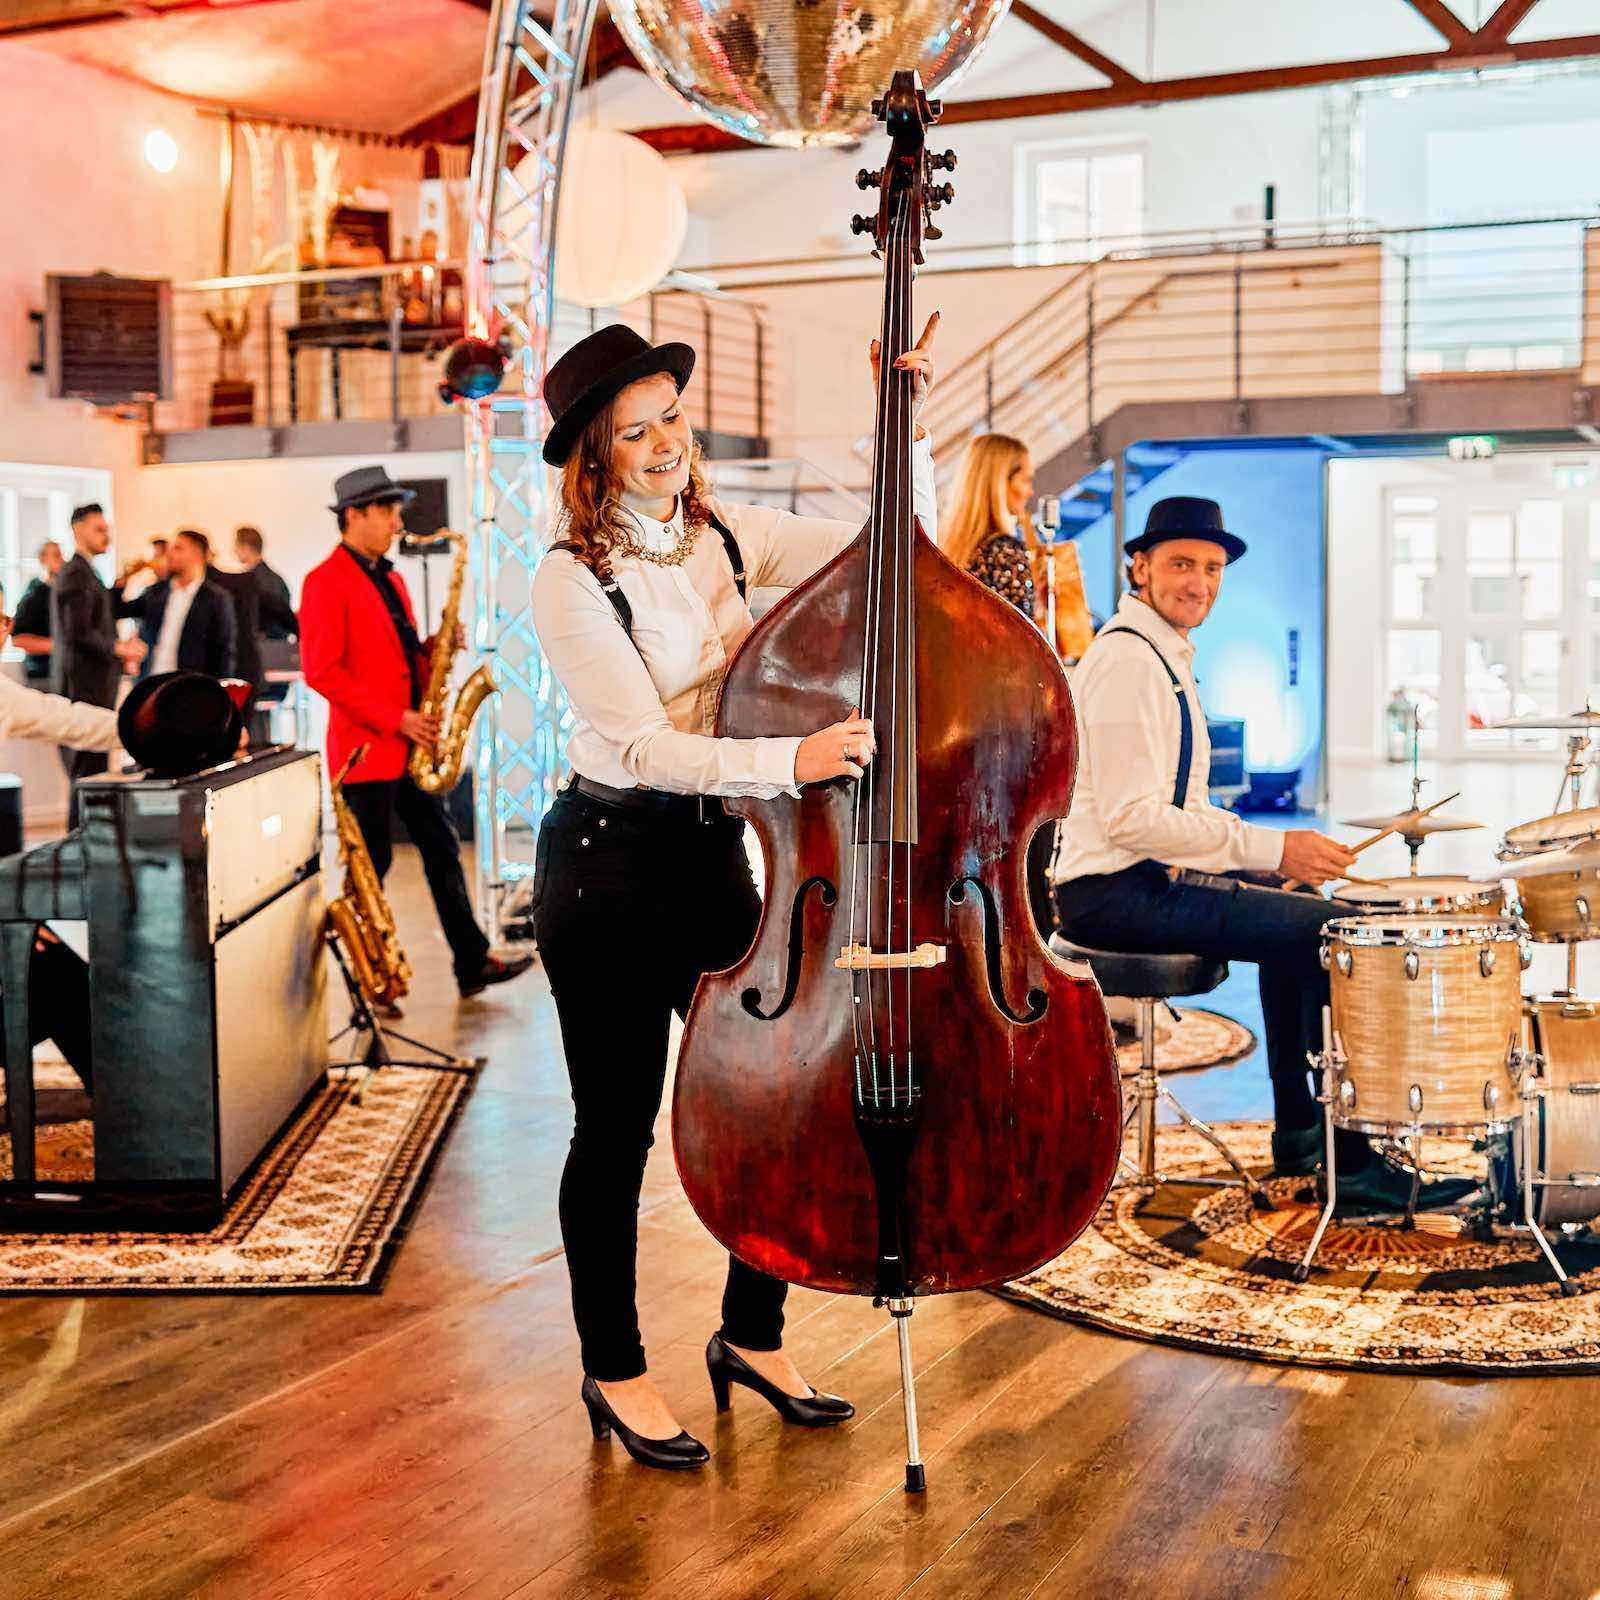 Band | Hochzeit | Empfang | Sektempfang | Gala | Messe | Event | Hannover | Popband | Jazzband | Sektempfang | Kontrabass | Piano | Schlagzeug | Gesang | Party | Trauung | Dinner | Buchen | Mieten | Lehmann | Eventservice